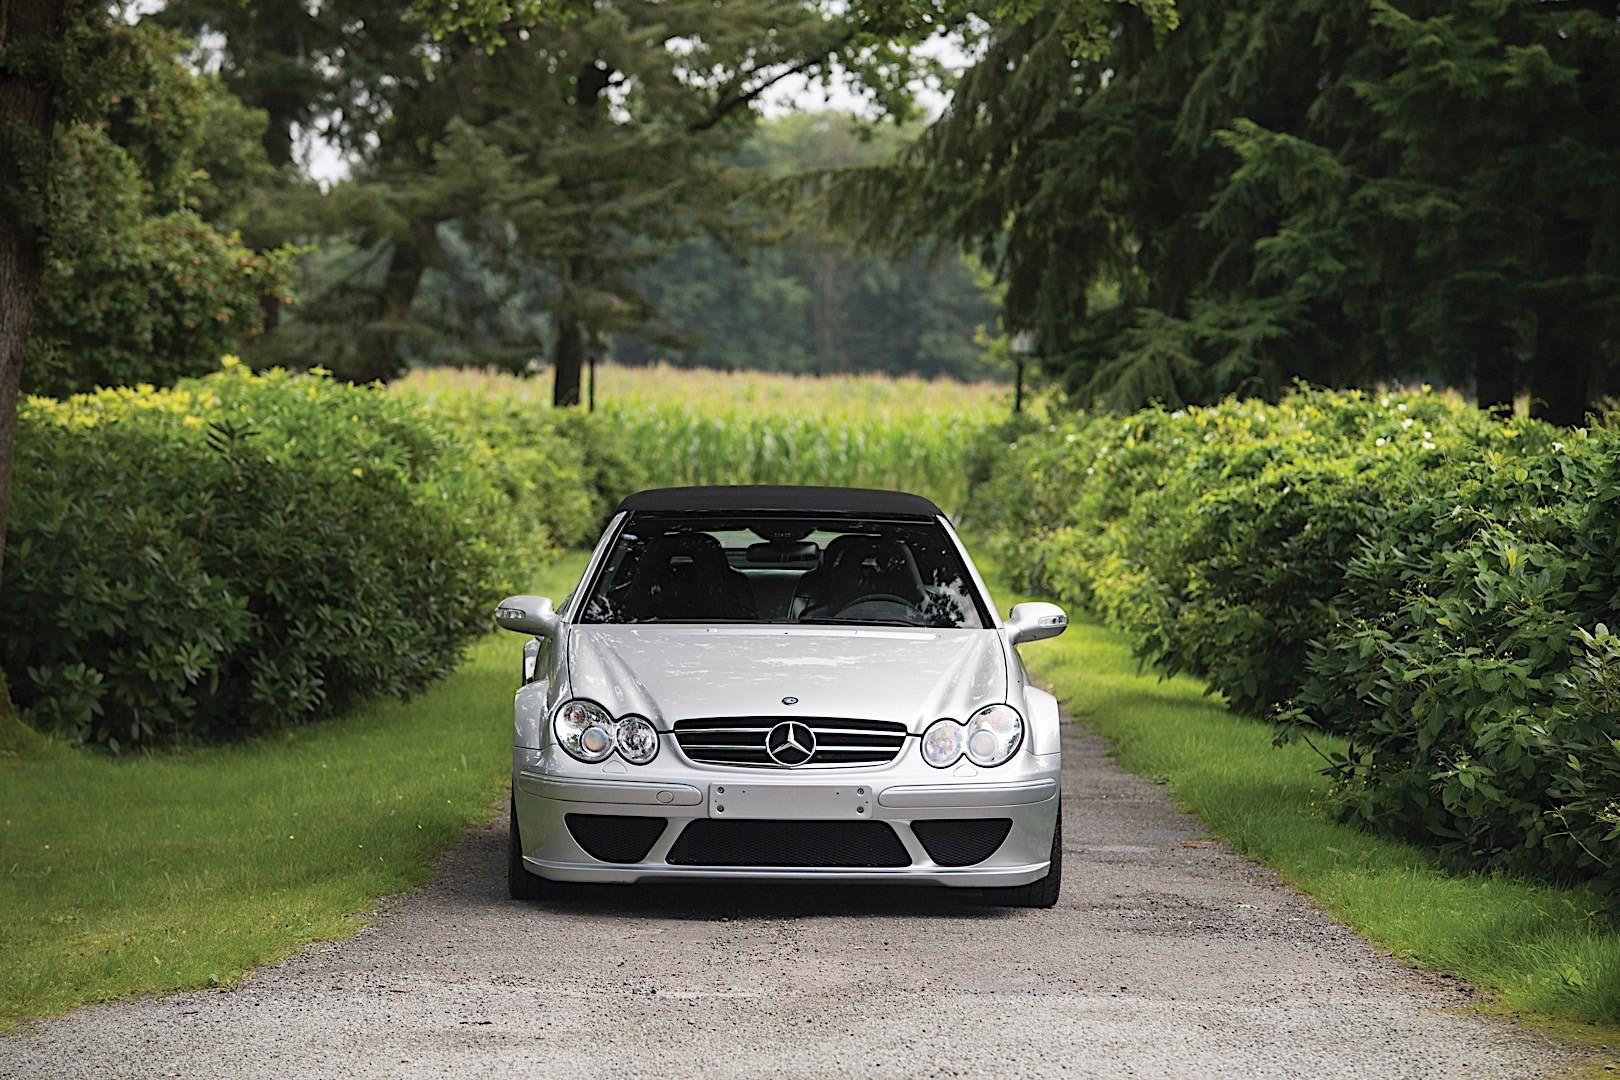 Mercedes benz clk dtm amg cabrio a209 specs 2006 for Mercedes benz clk dtm